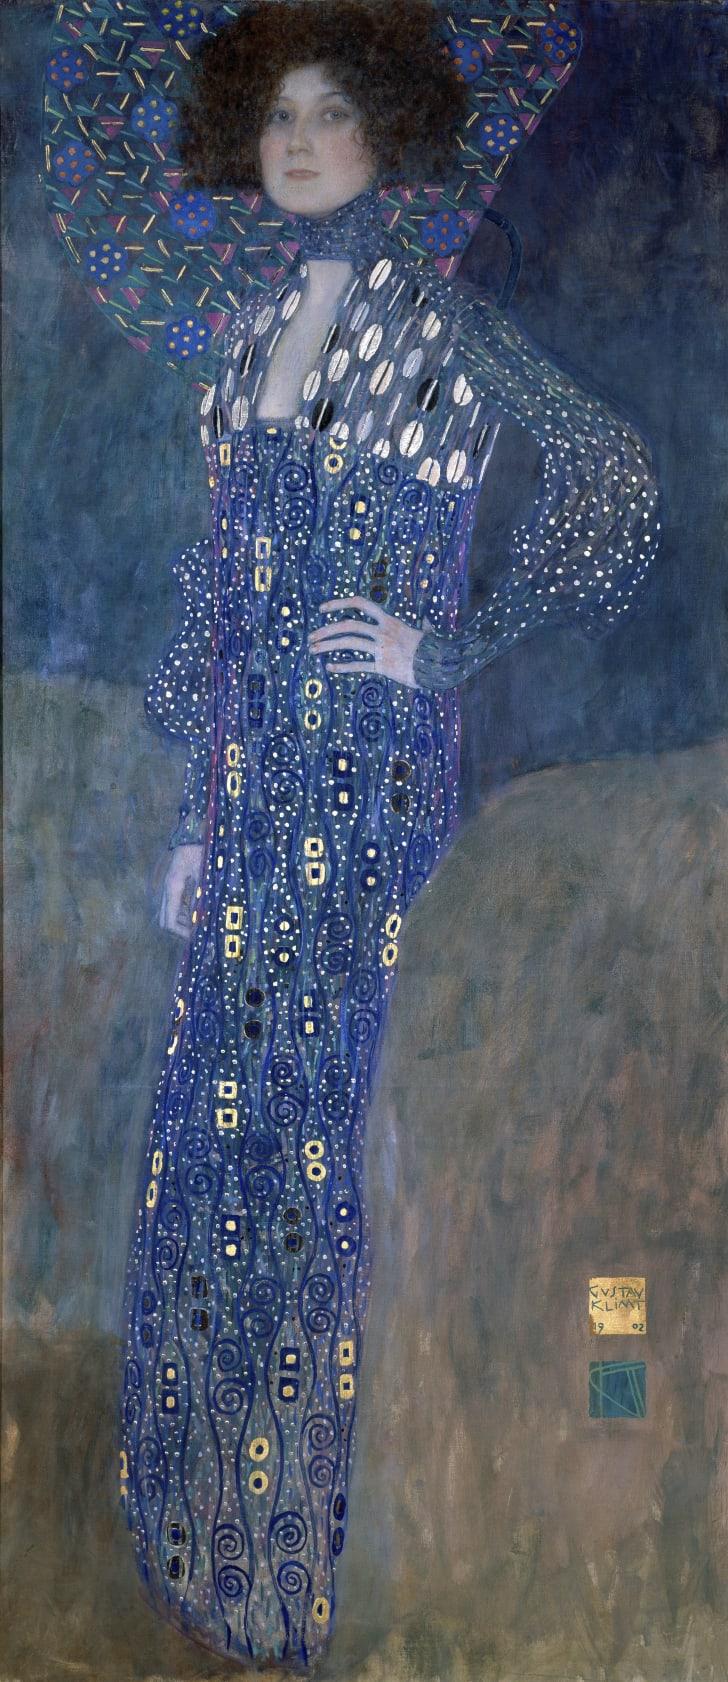 Emilie Louise Floege (Floge) by Gustav Klimt